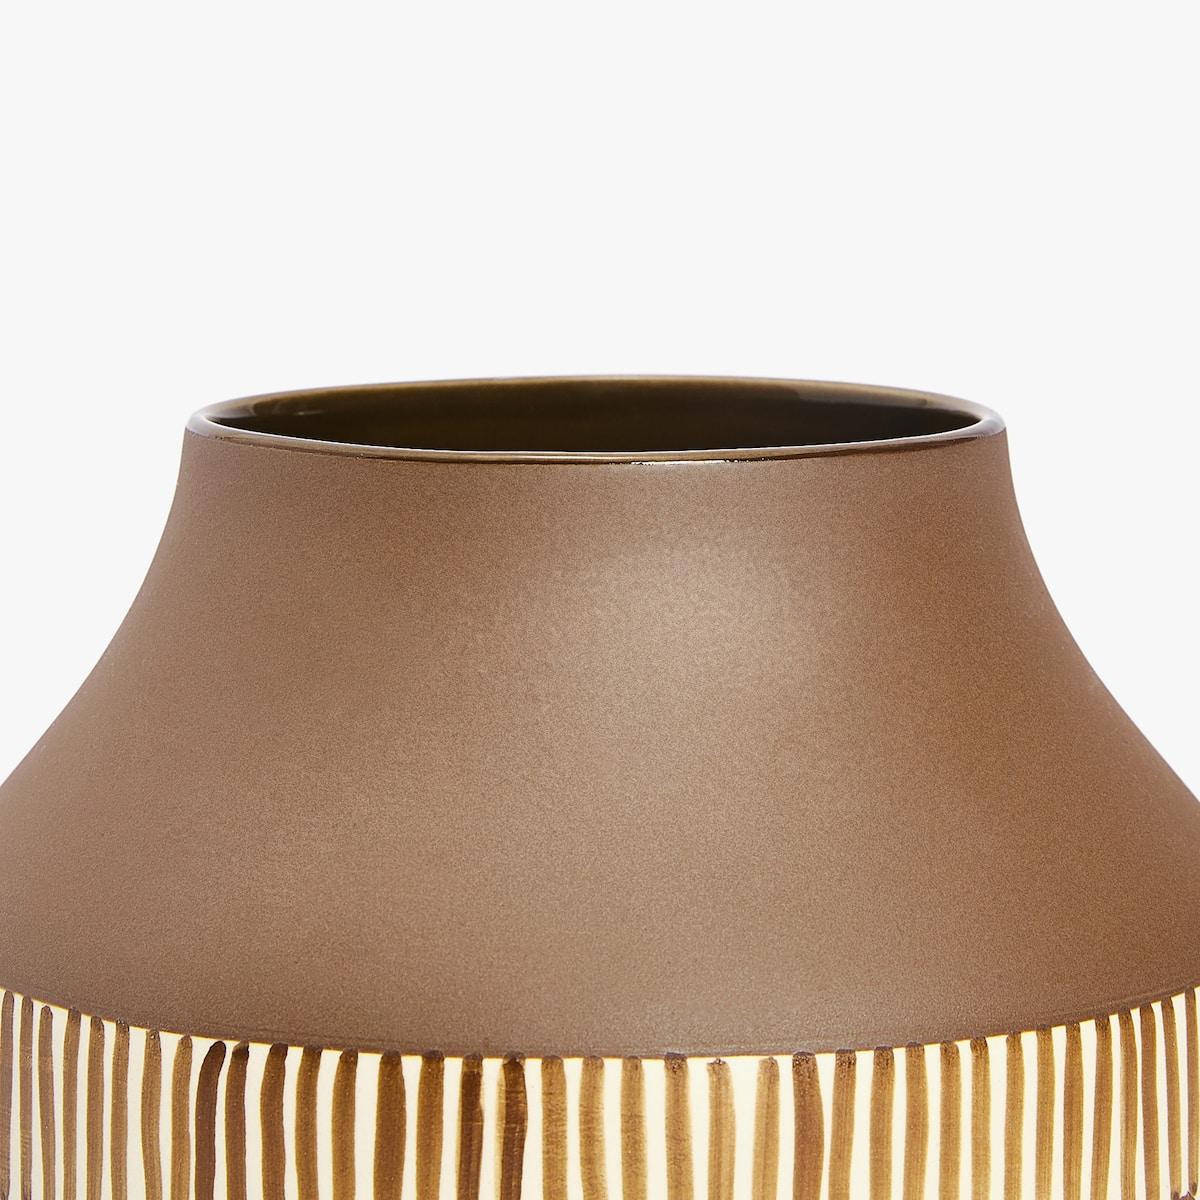 Printed base ceramic vase vases decoration zara home indonesia image stopboris Images